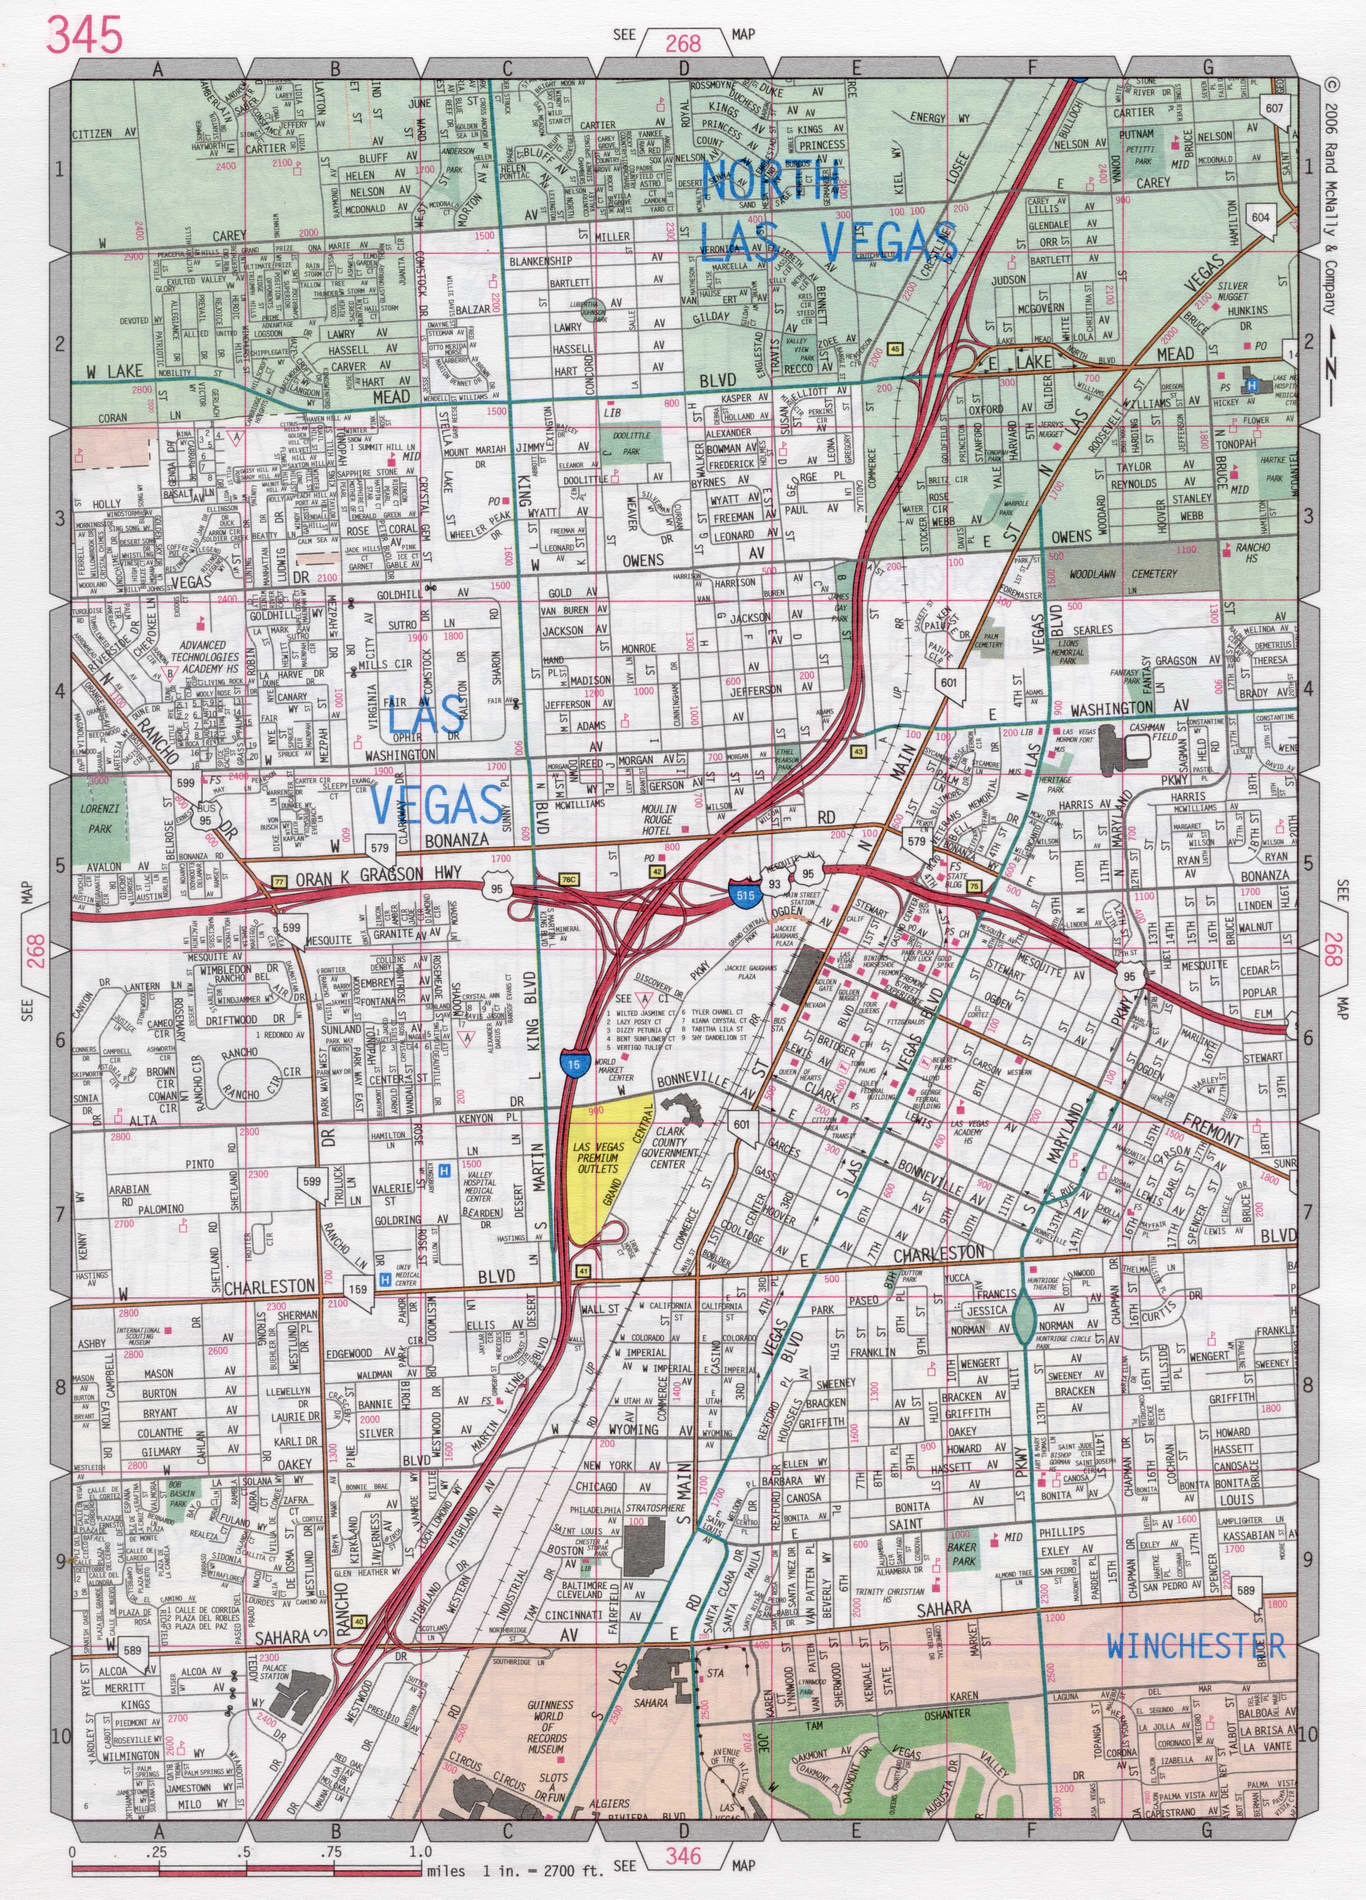 Las Vegas Street Map Las Vegas road map